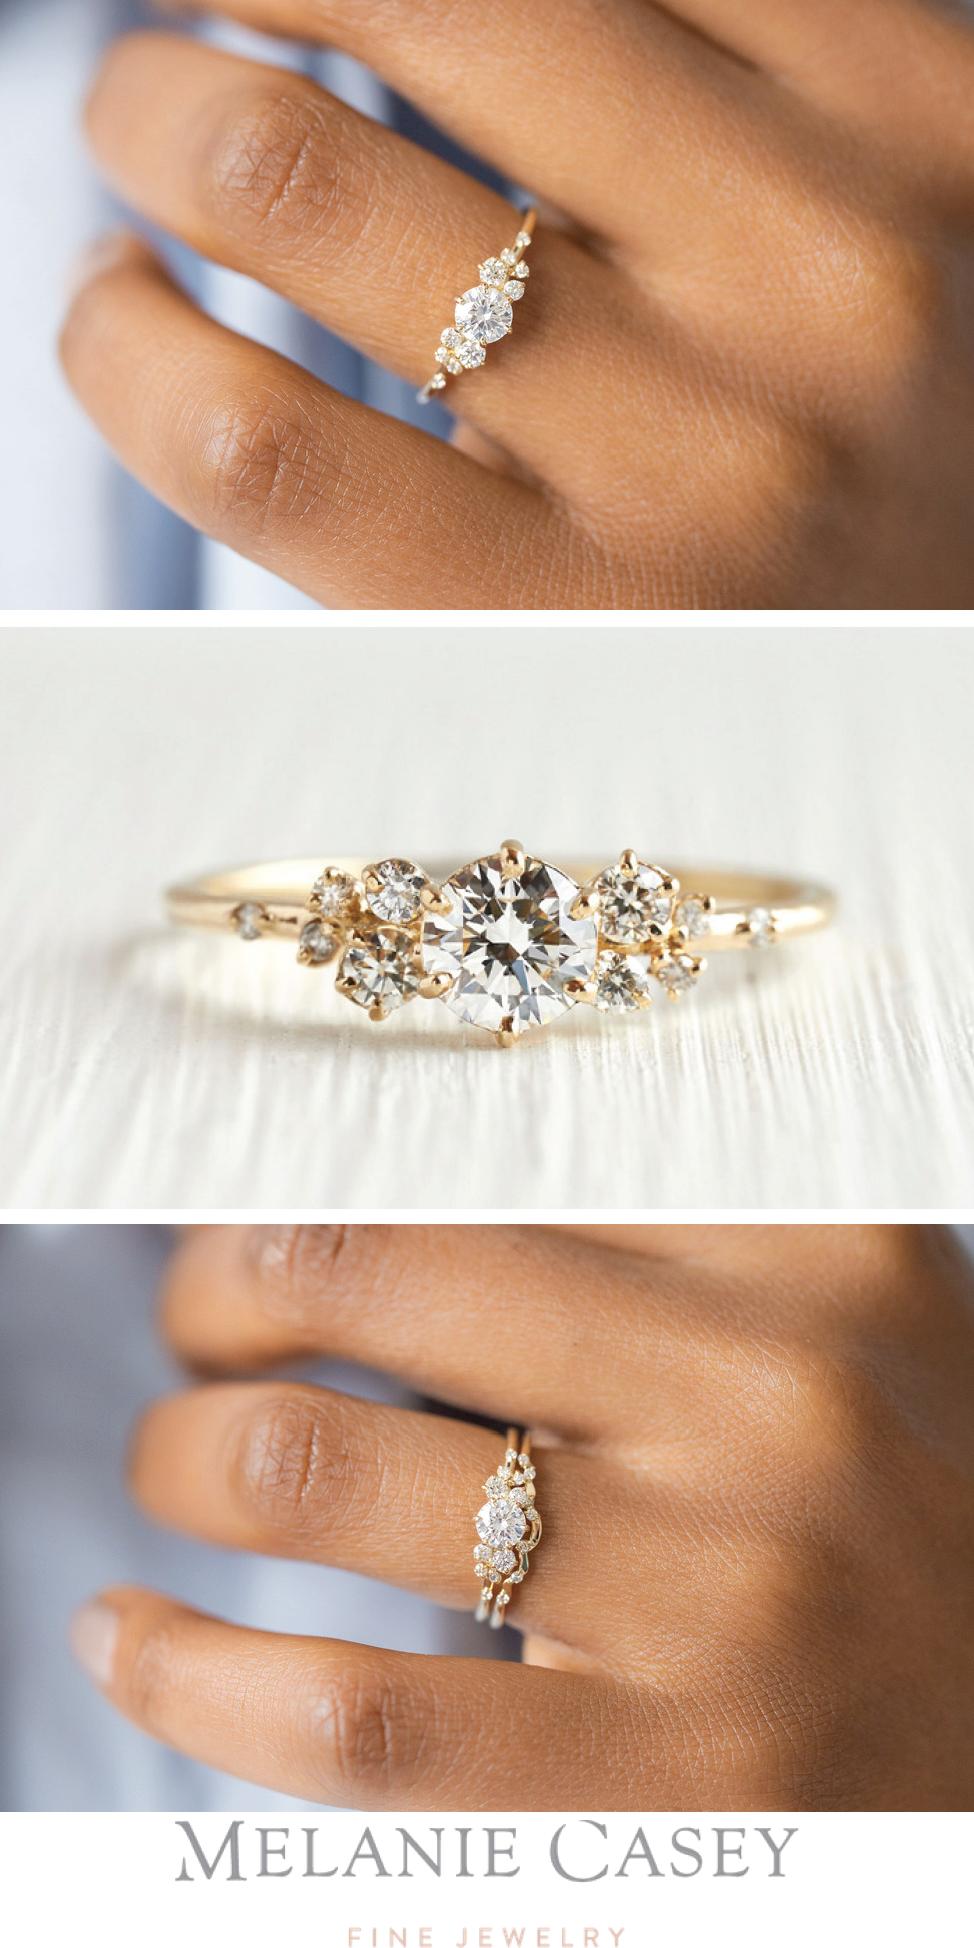 Bridal Mujeres Compromiso Ring Set Joyeria de la boda Crystal Morganite Diamond